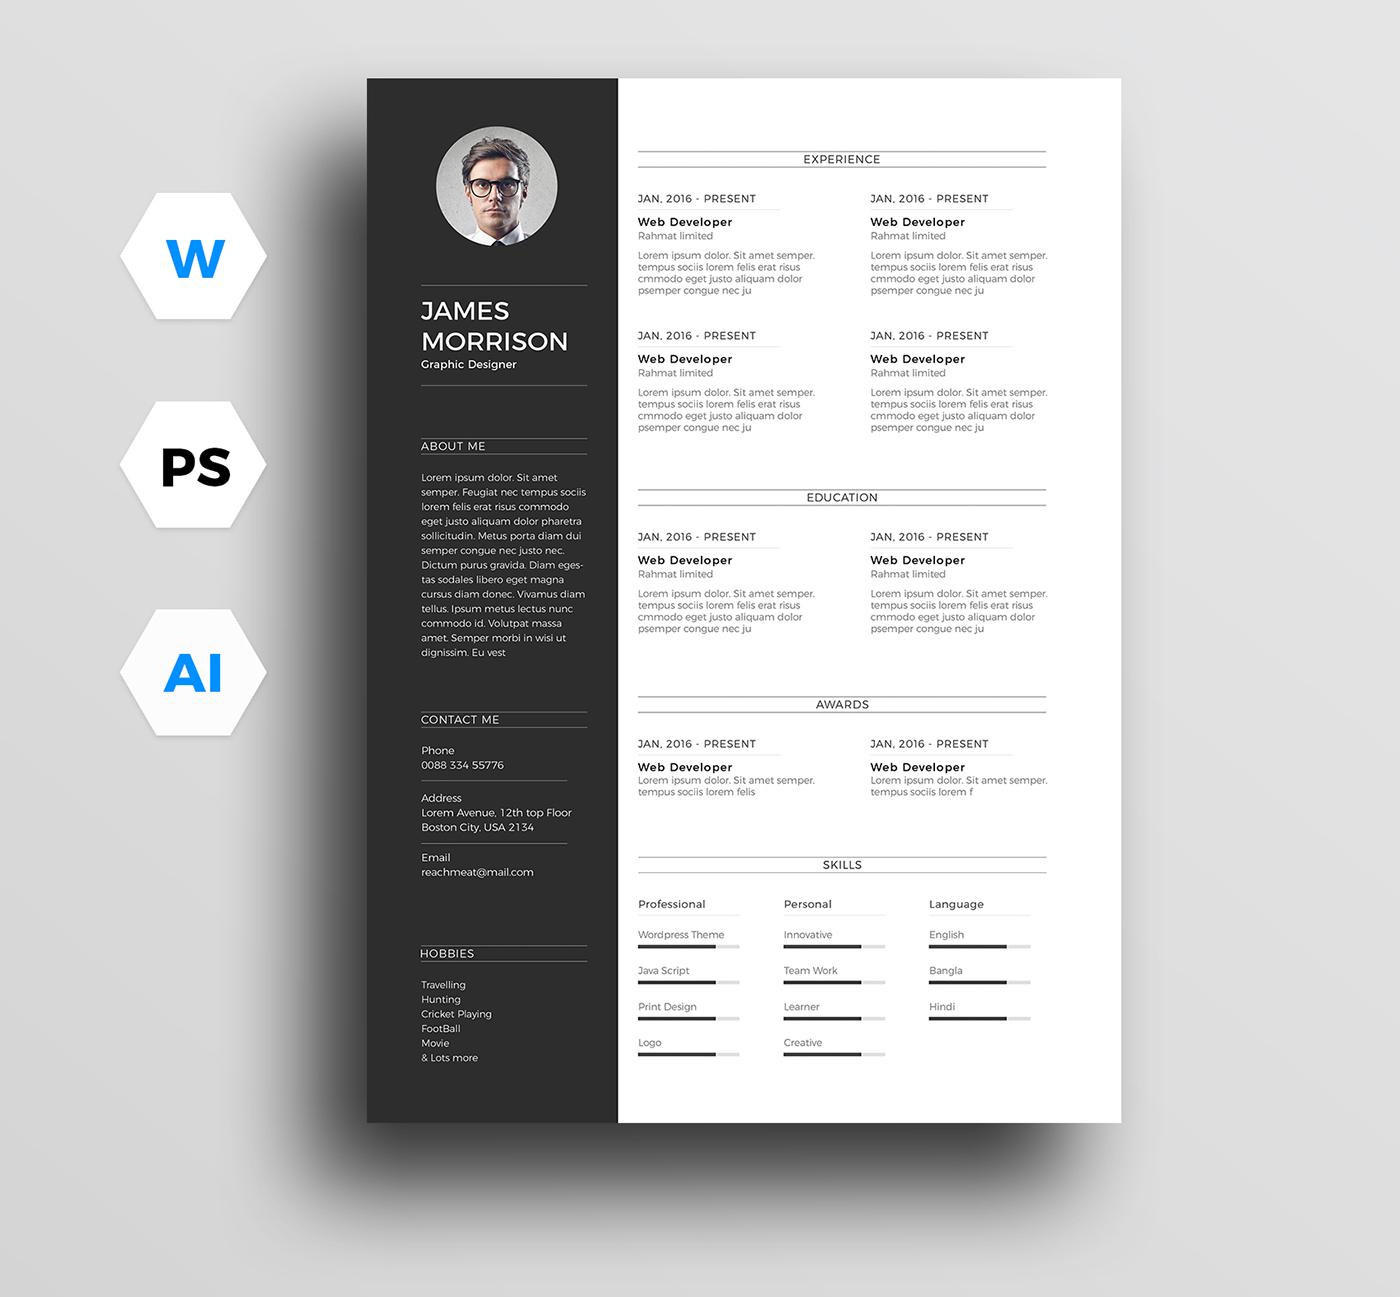 a4 resume template clean resume creative resume template CV template cv word elegant resume Resume resume creative